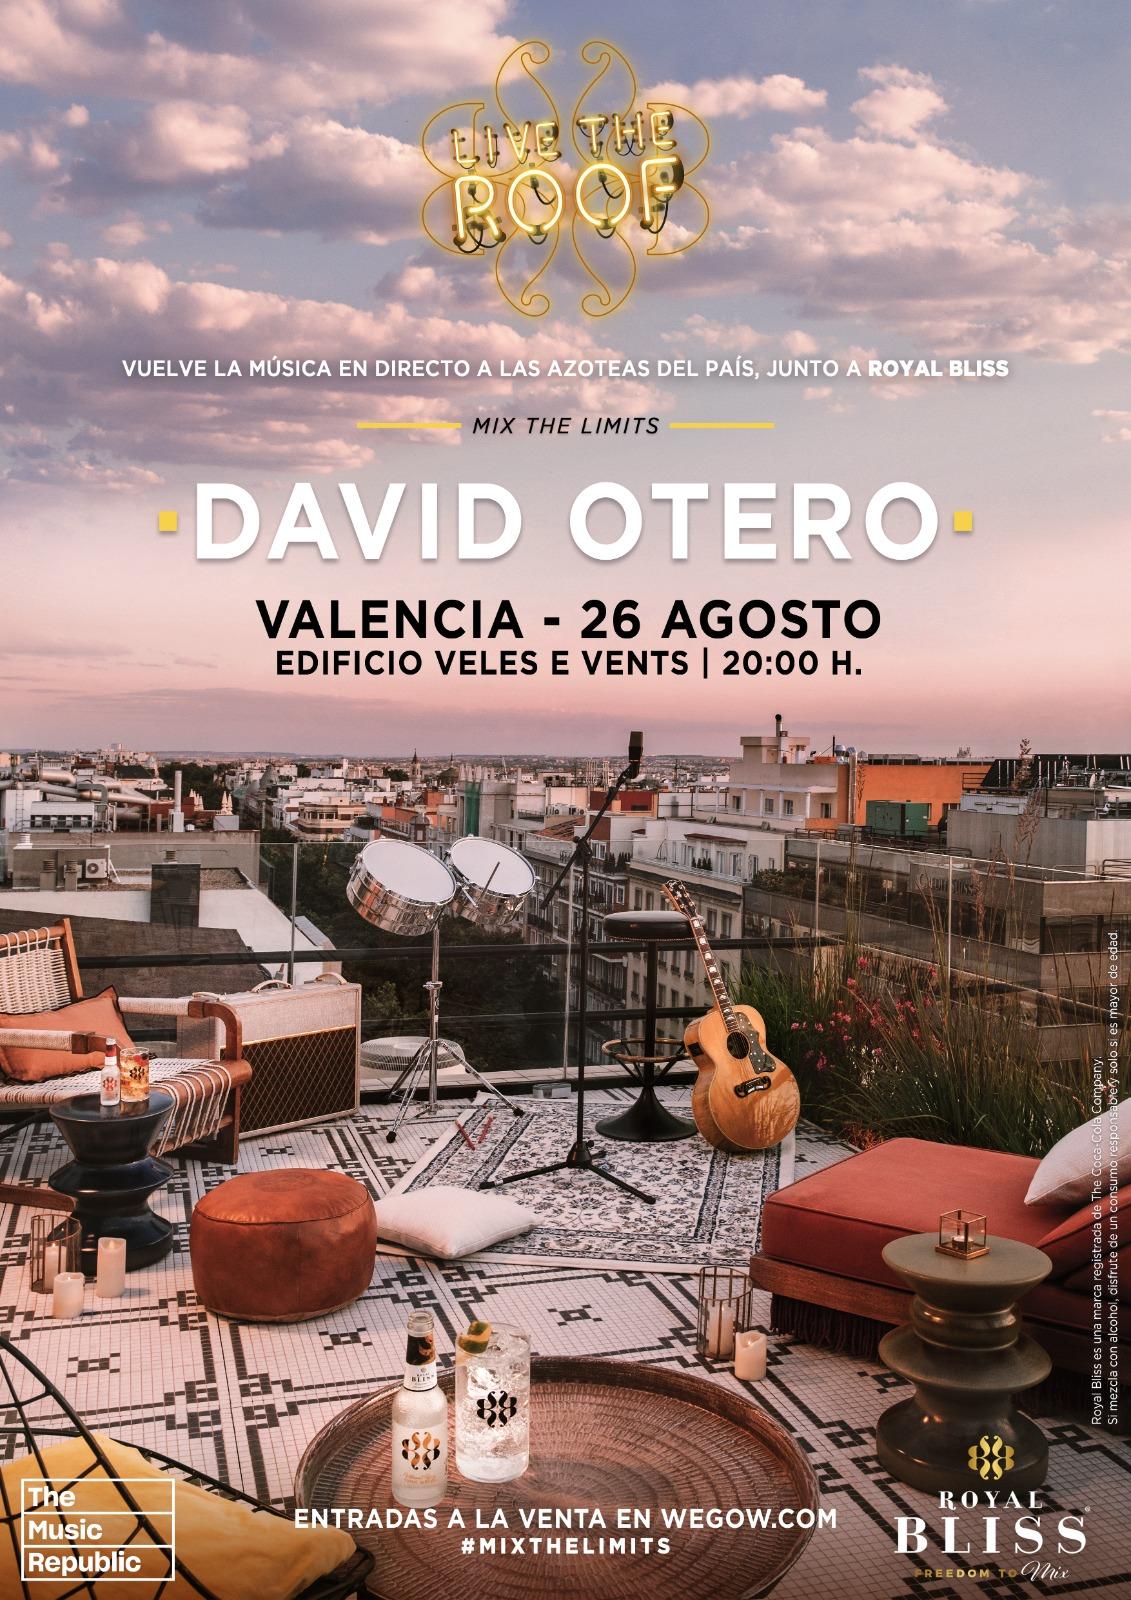 david otero en live the roof valencia 1623915324849408